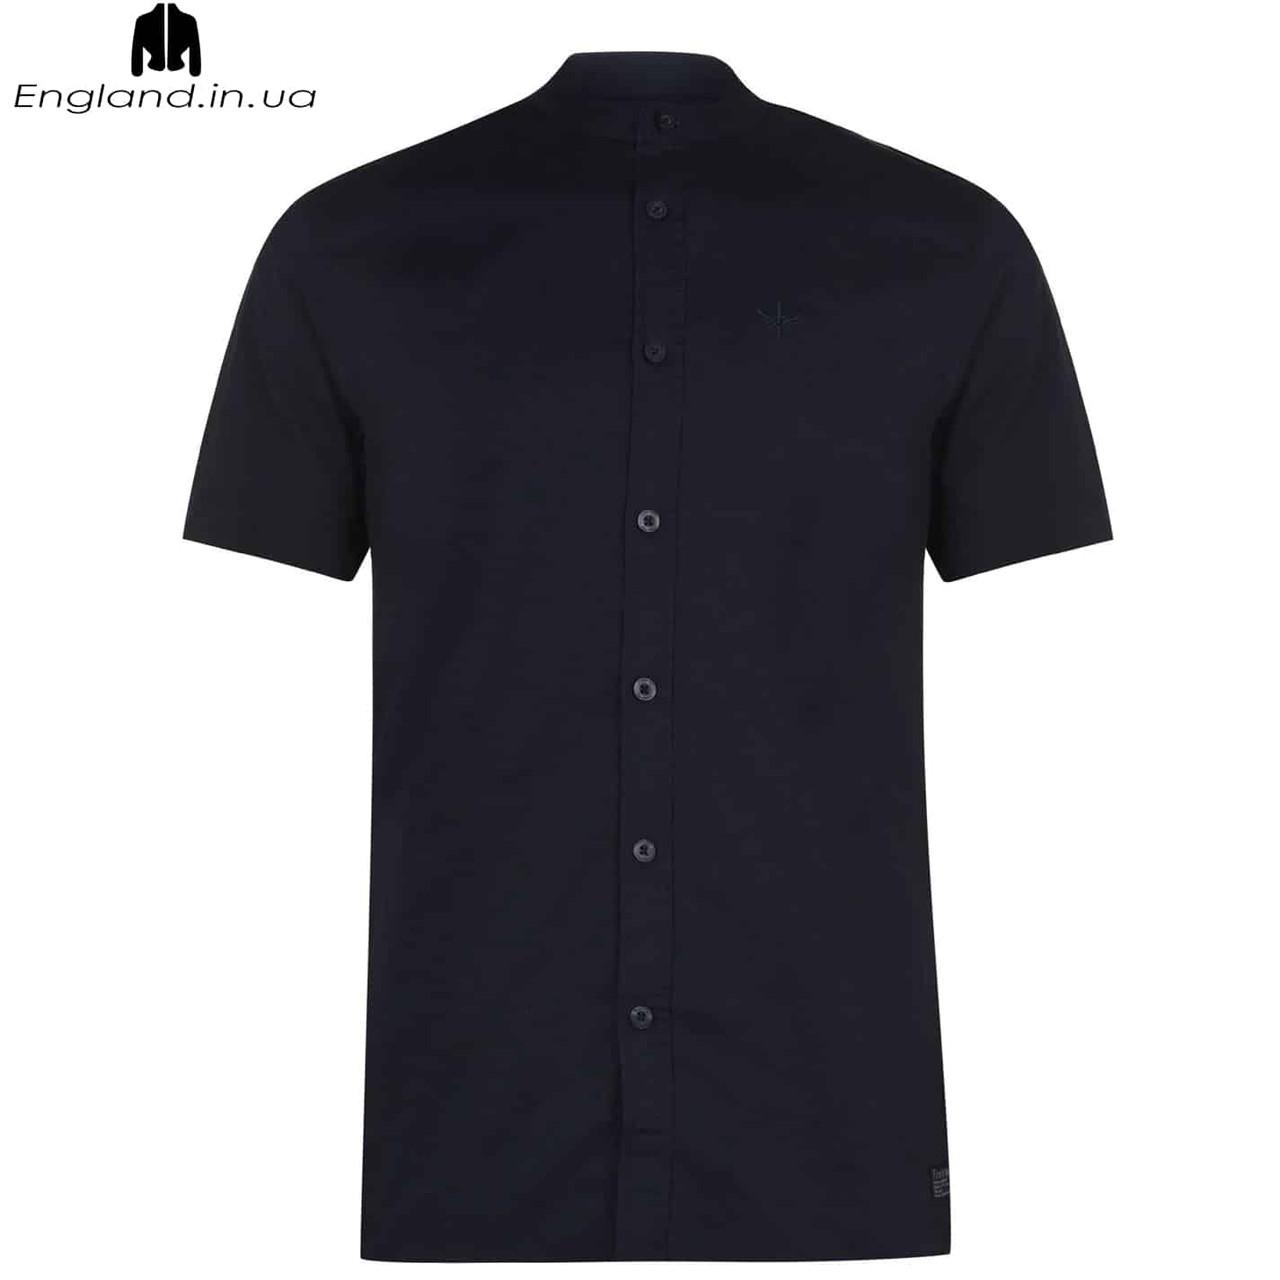 Рубашка мужская Firetrap из Англии - на короткий рукав